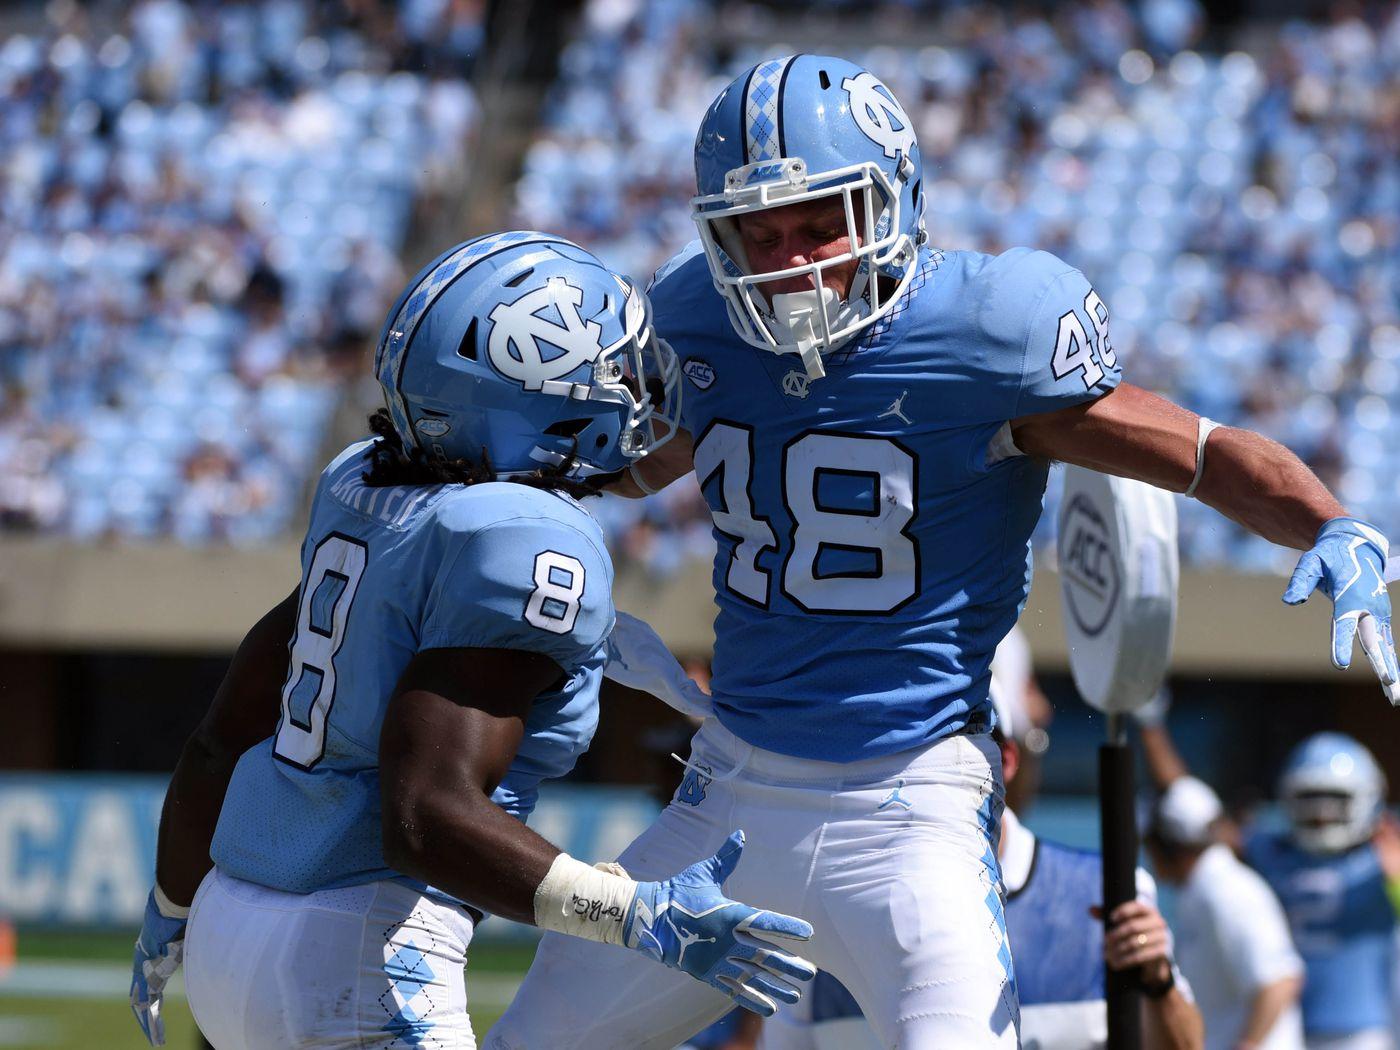 Austin Proehl North Carolina Tar Heels Jordan Football Jersey - Light Blue